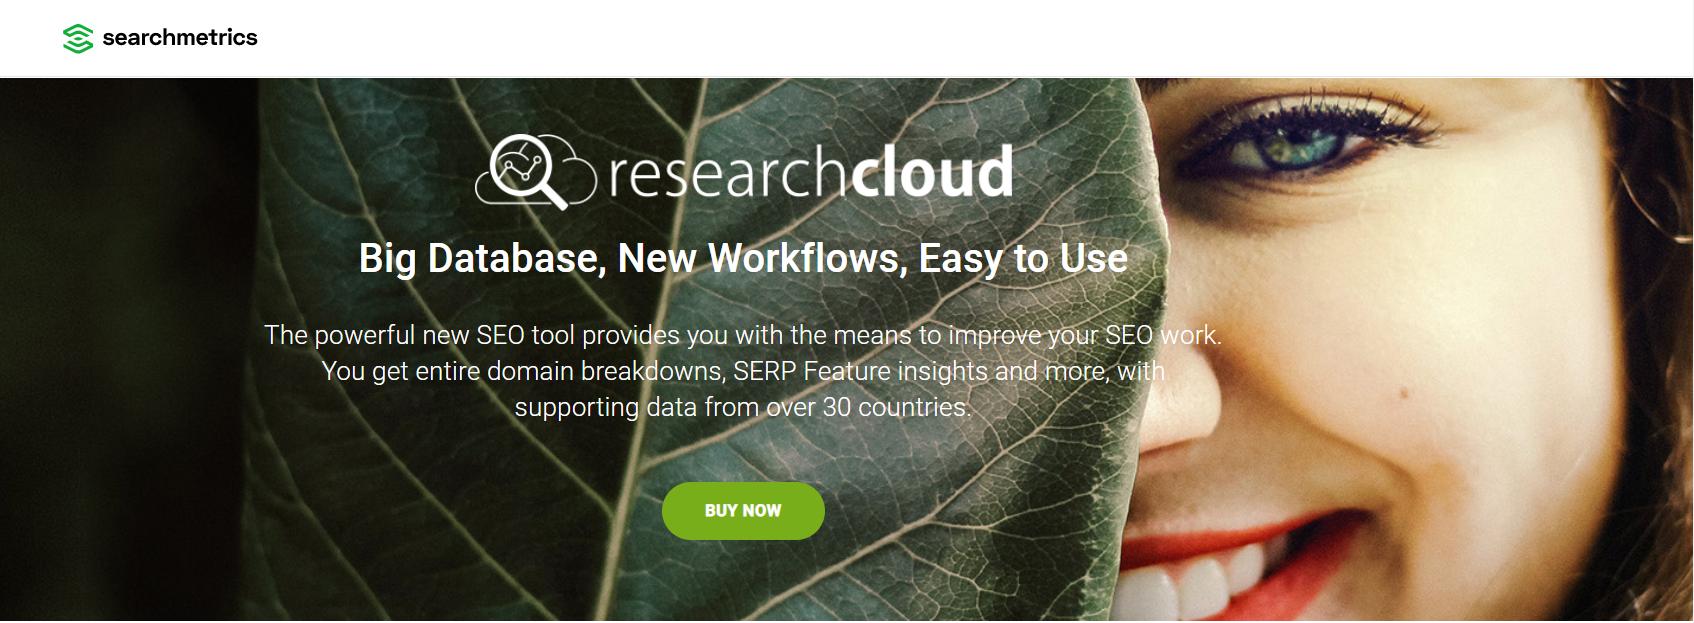 Searchmetrics -